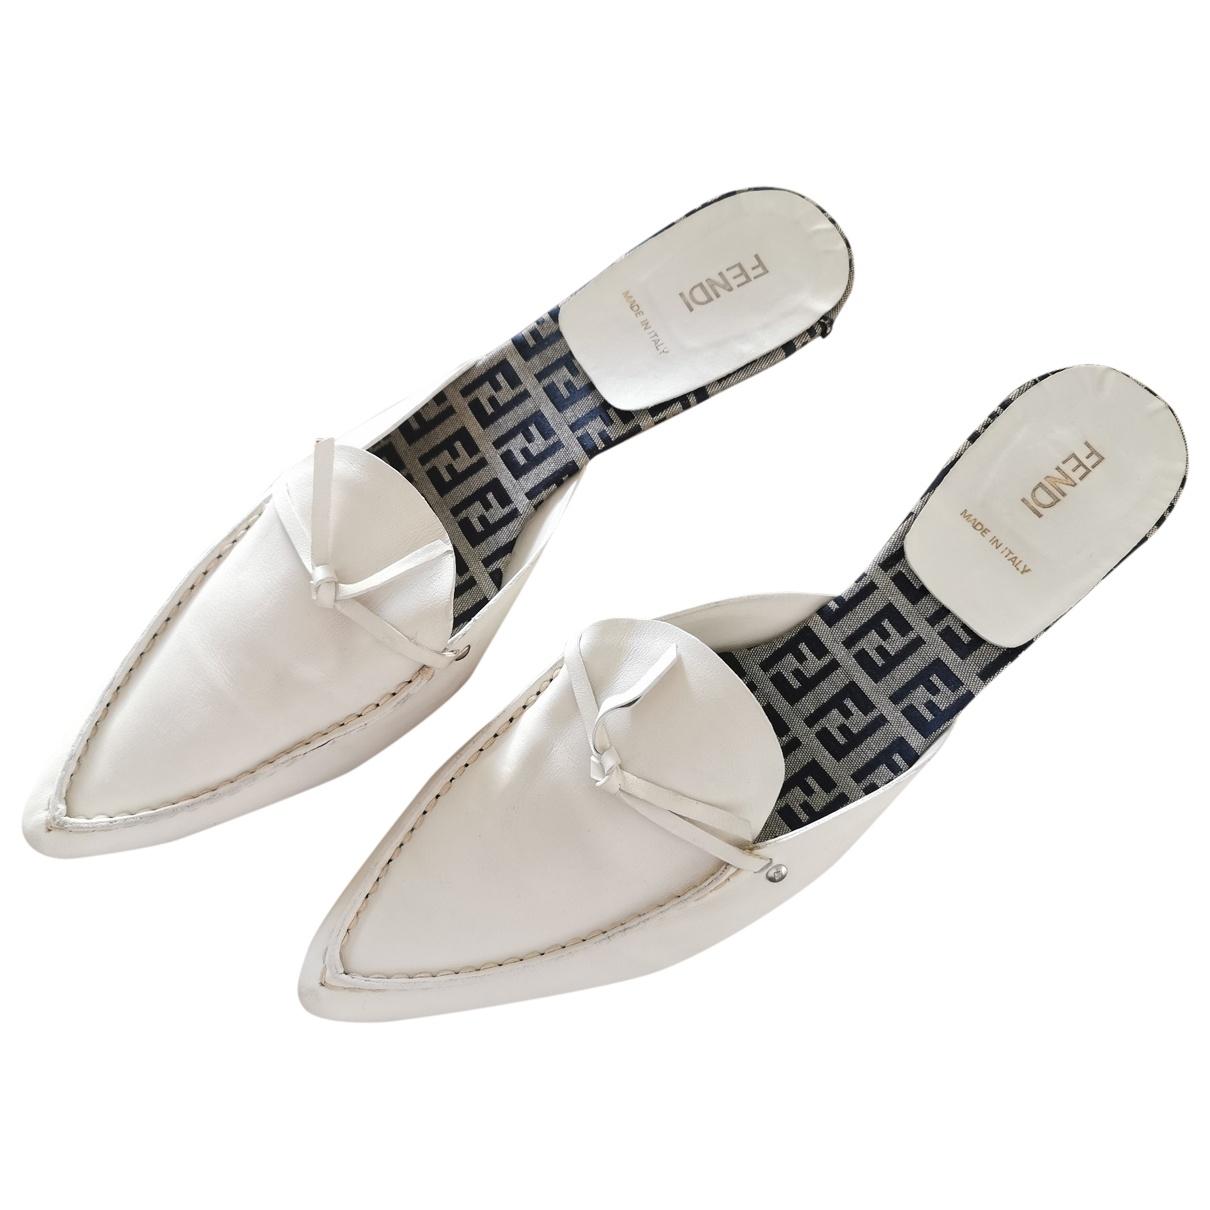 Fendi \N White Leather Mules & Clogs for Women 40 EU